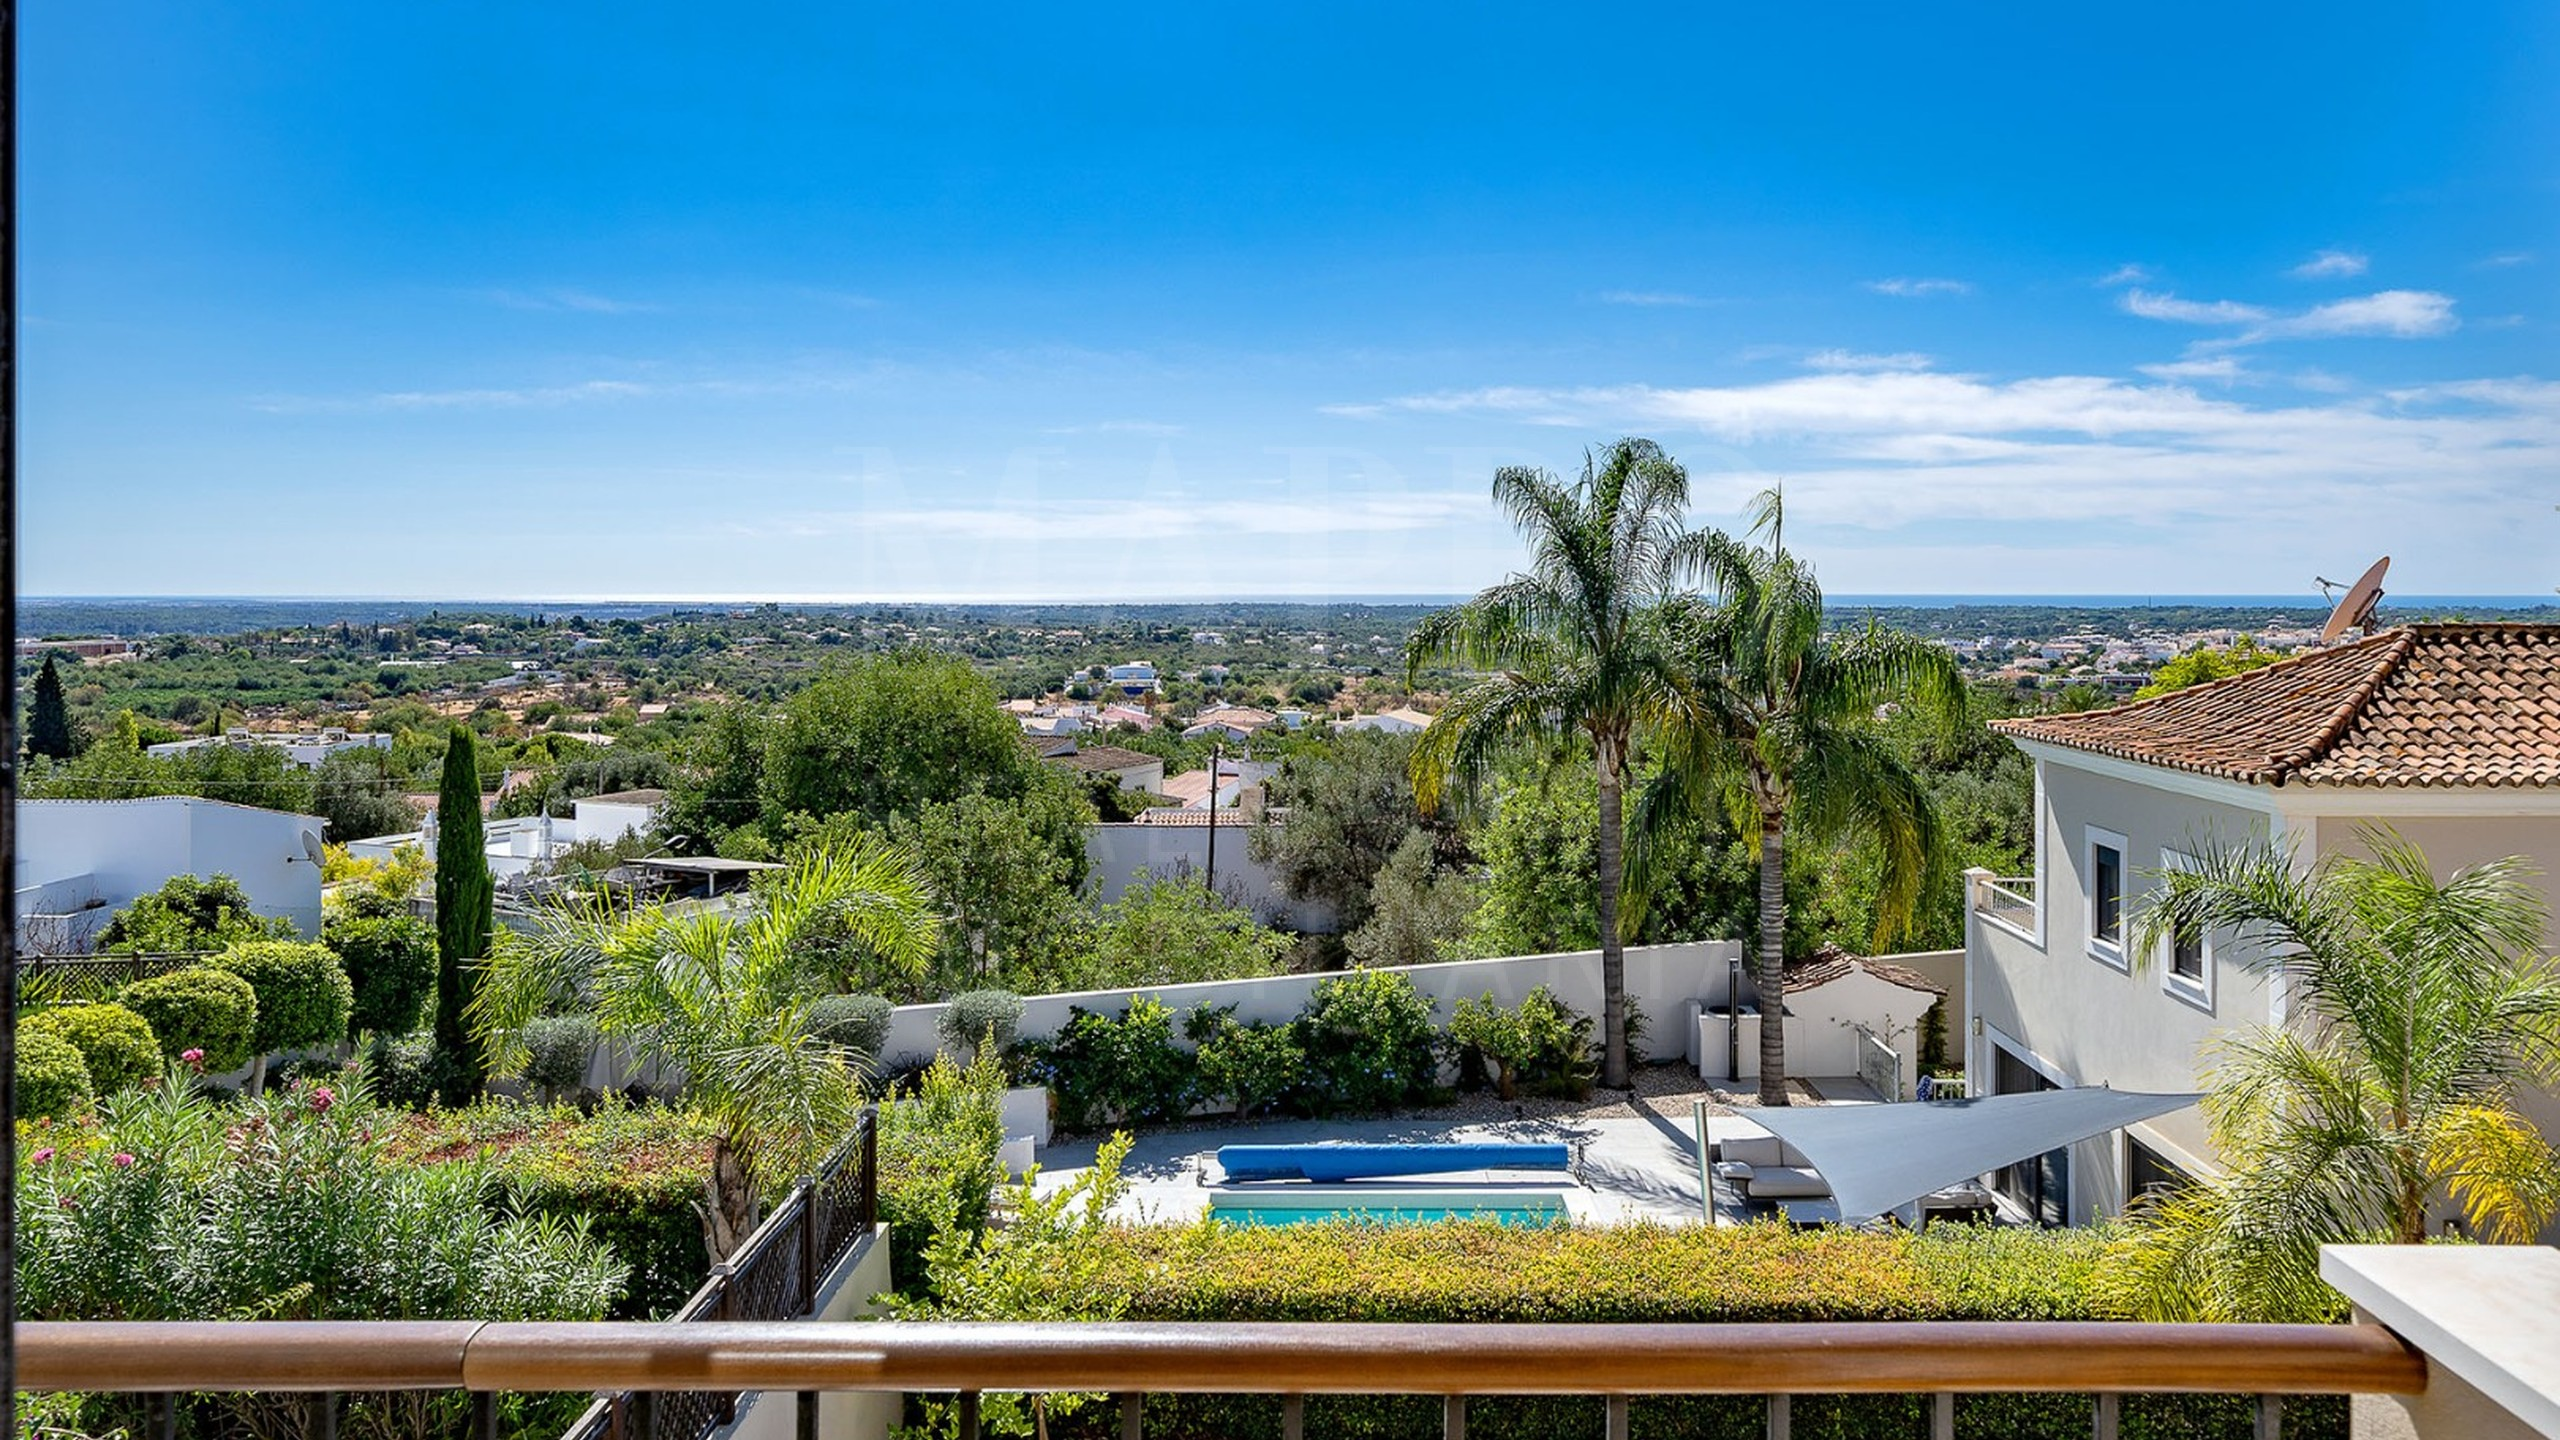 Semi-detached 3+1 bedroom villa situated in Vale Formoso, Algarve